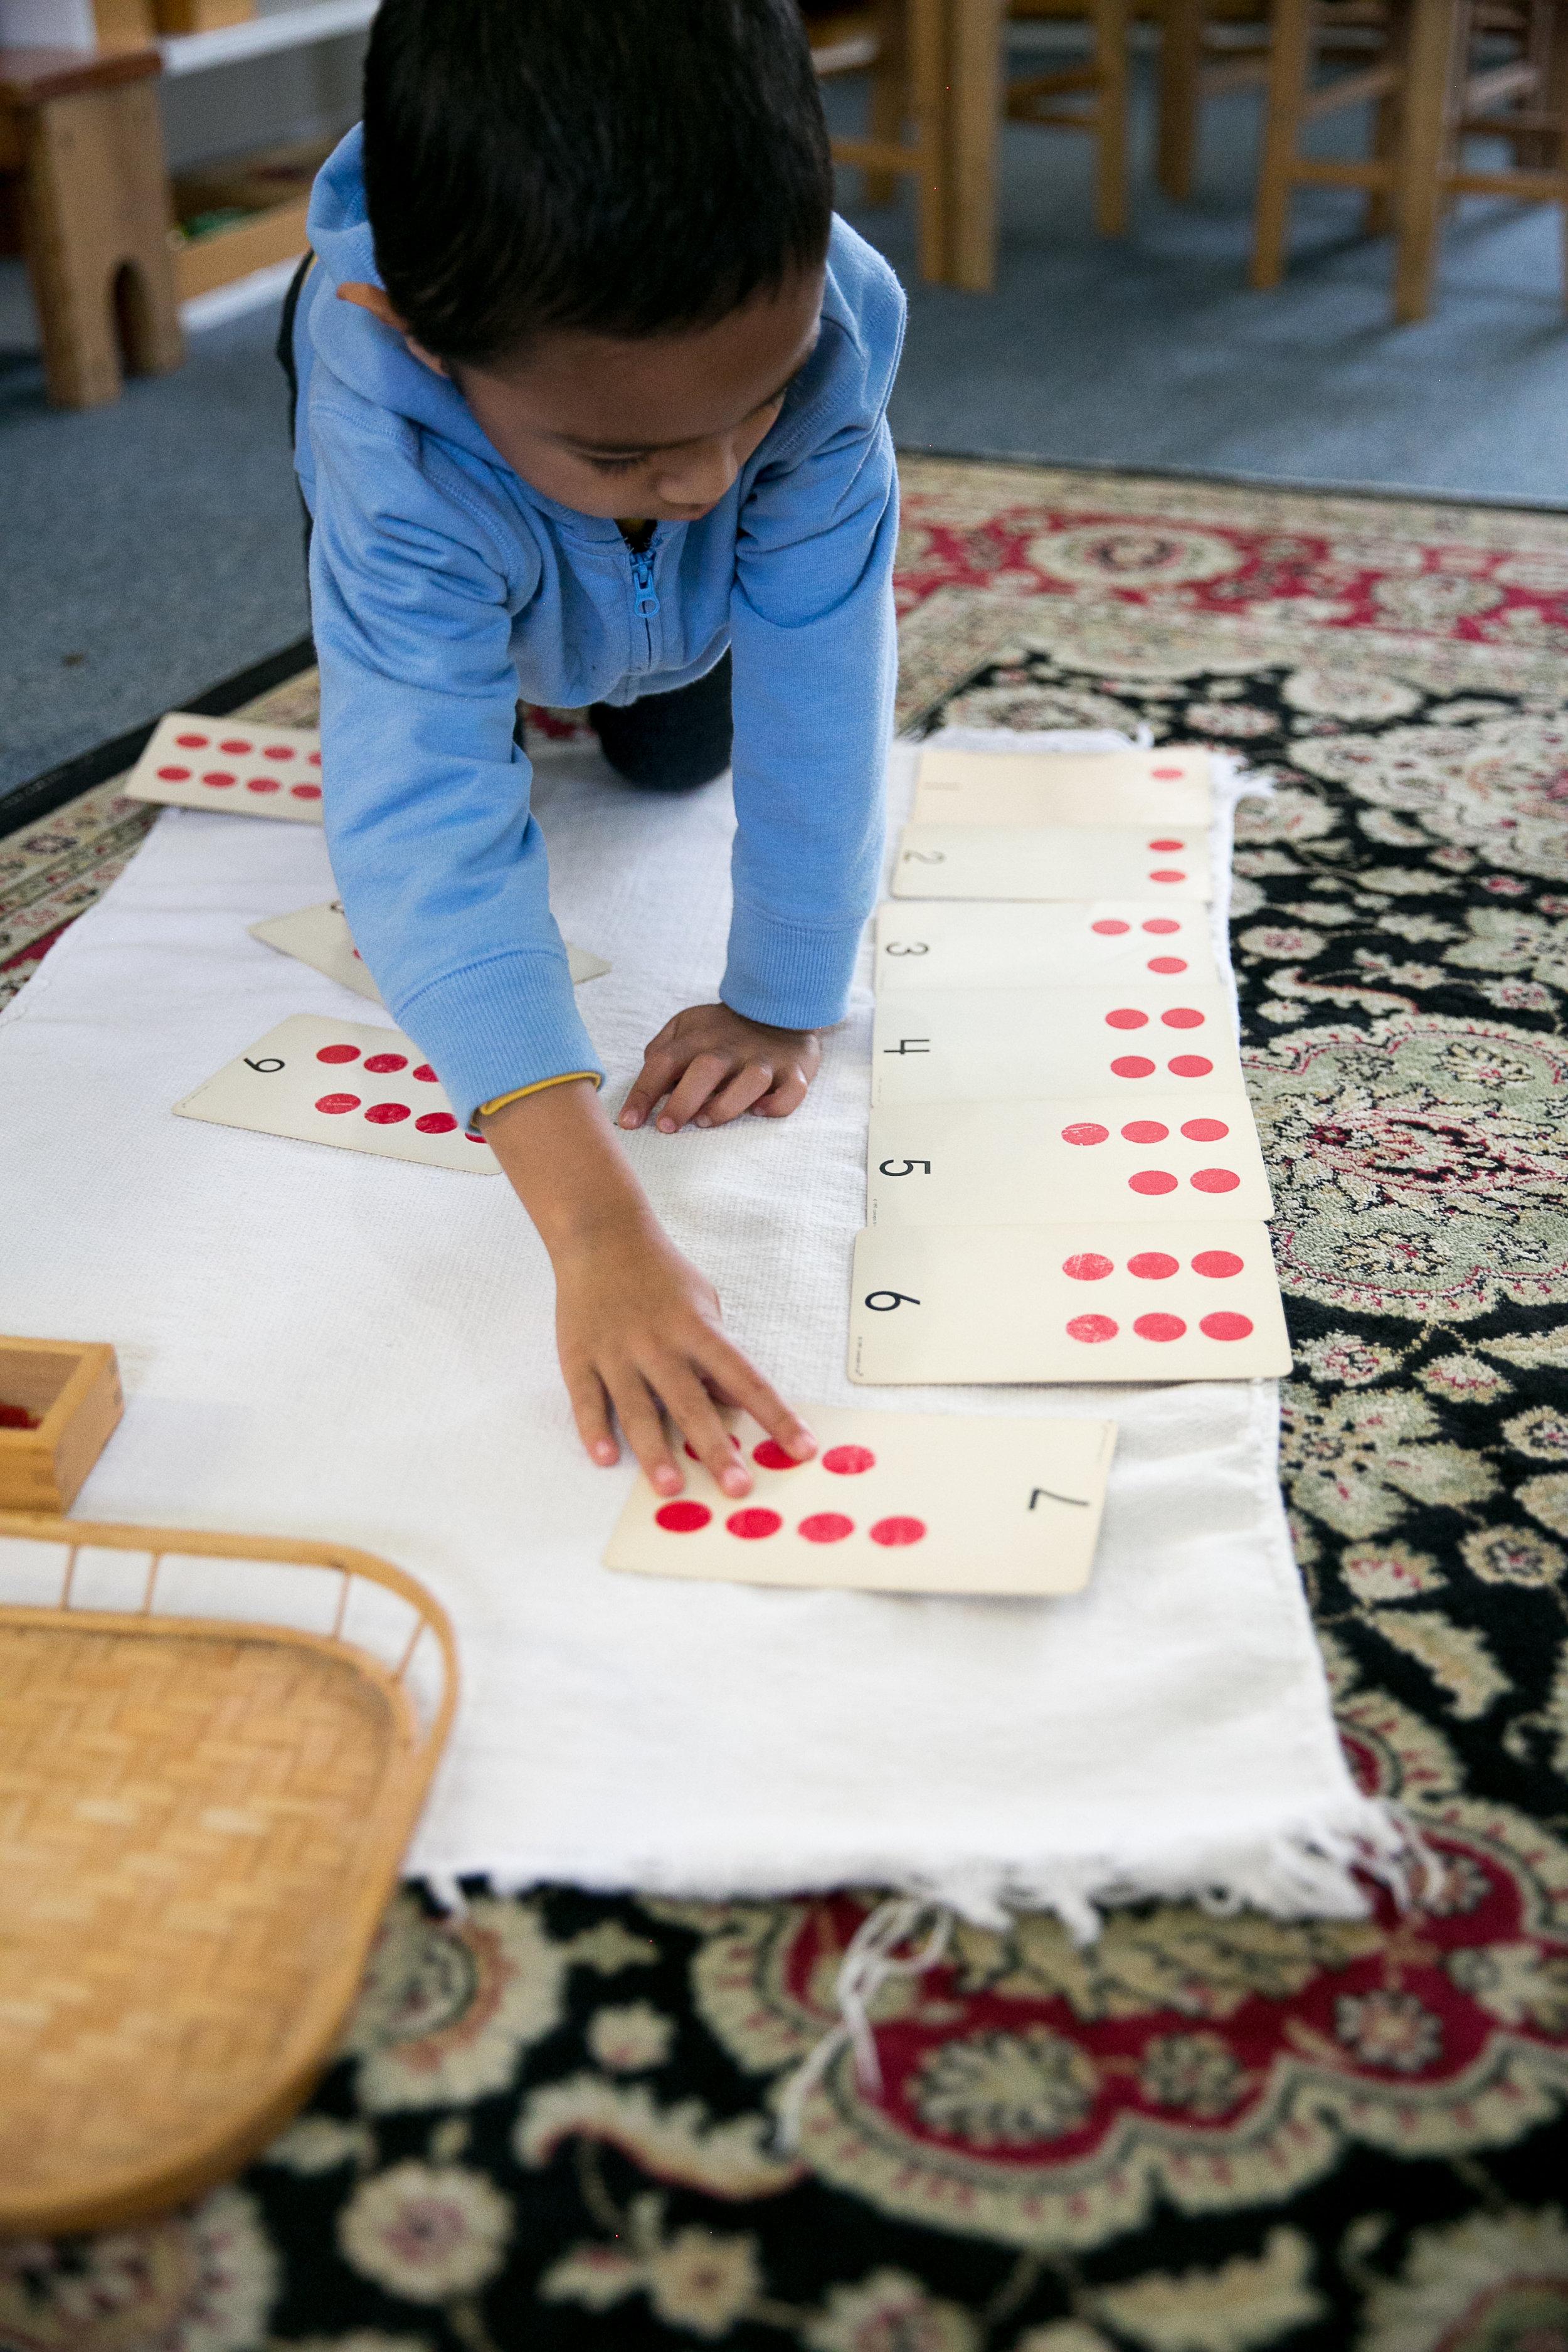 Rosehill_Montessori_Preschool_Kindergarten_classroom_reading_math_science_writing_learning_curriculum_French_Enrichment_Testimonial_Parents.jpg